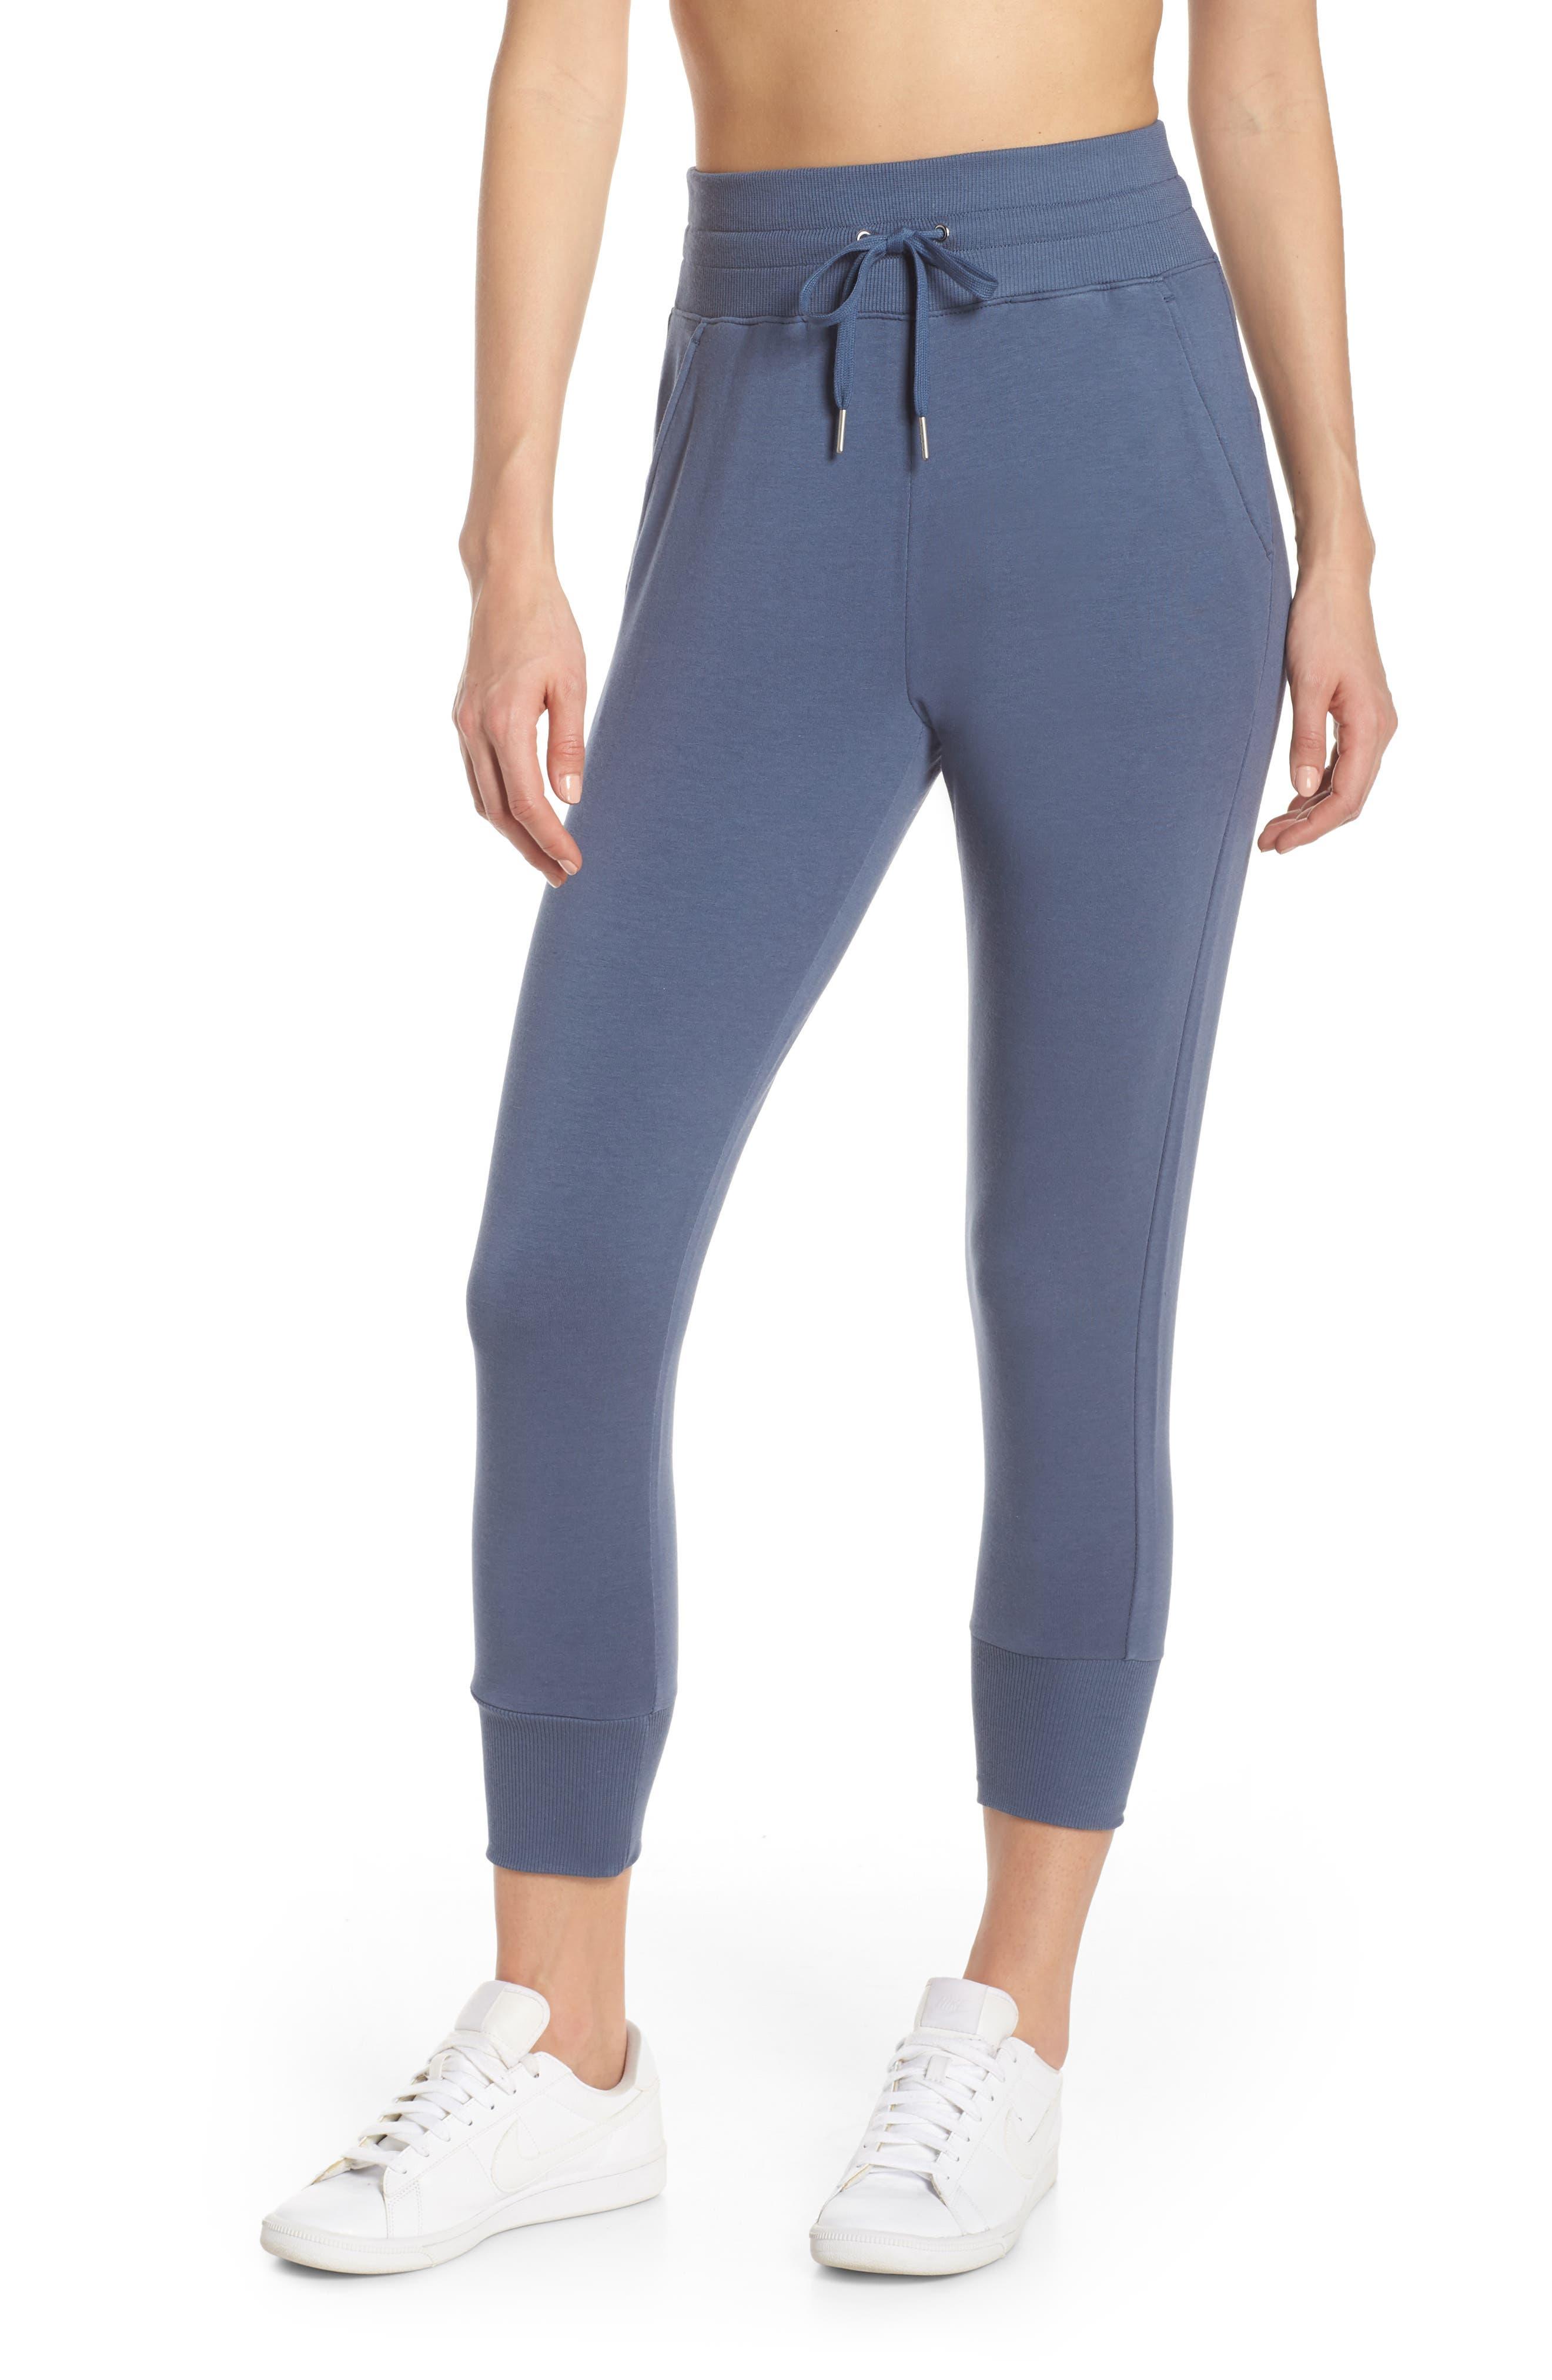 ZELLA Repeat High Waist Crop Jogger Pants, Main, color, BLUE VINTAGE